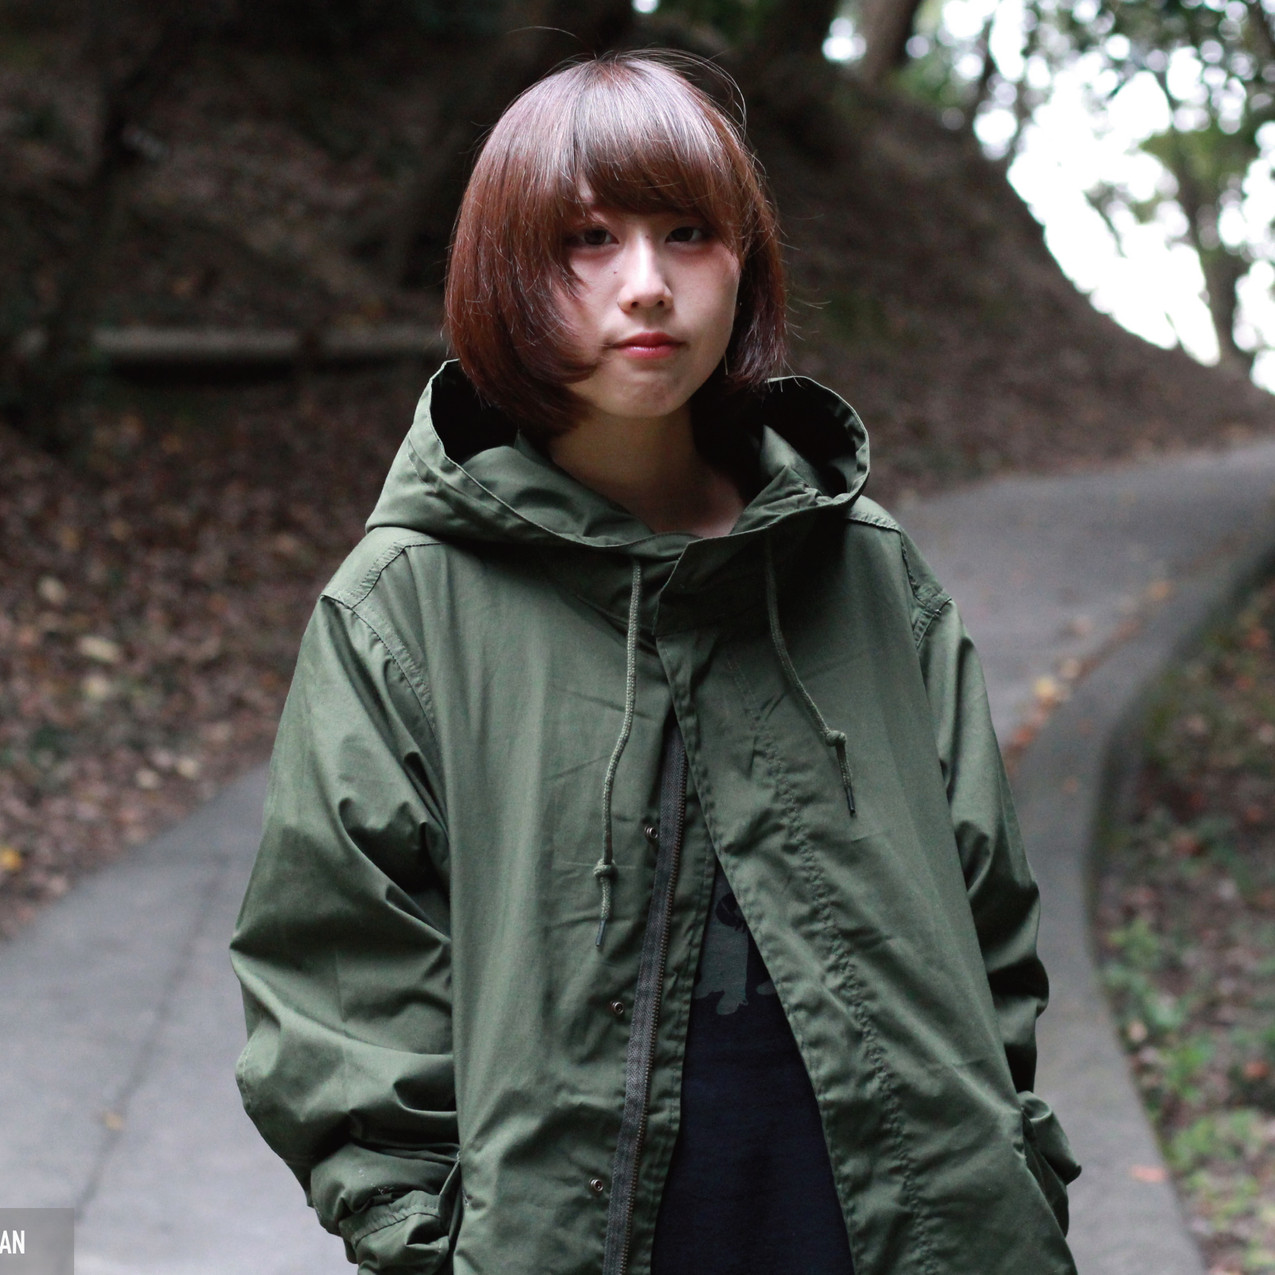 kawaiko-chan-FUMIKA-08